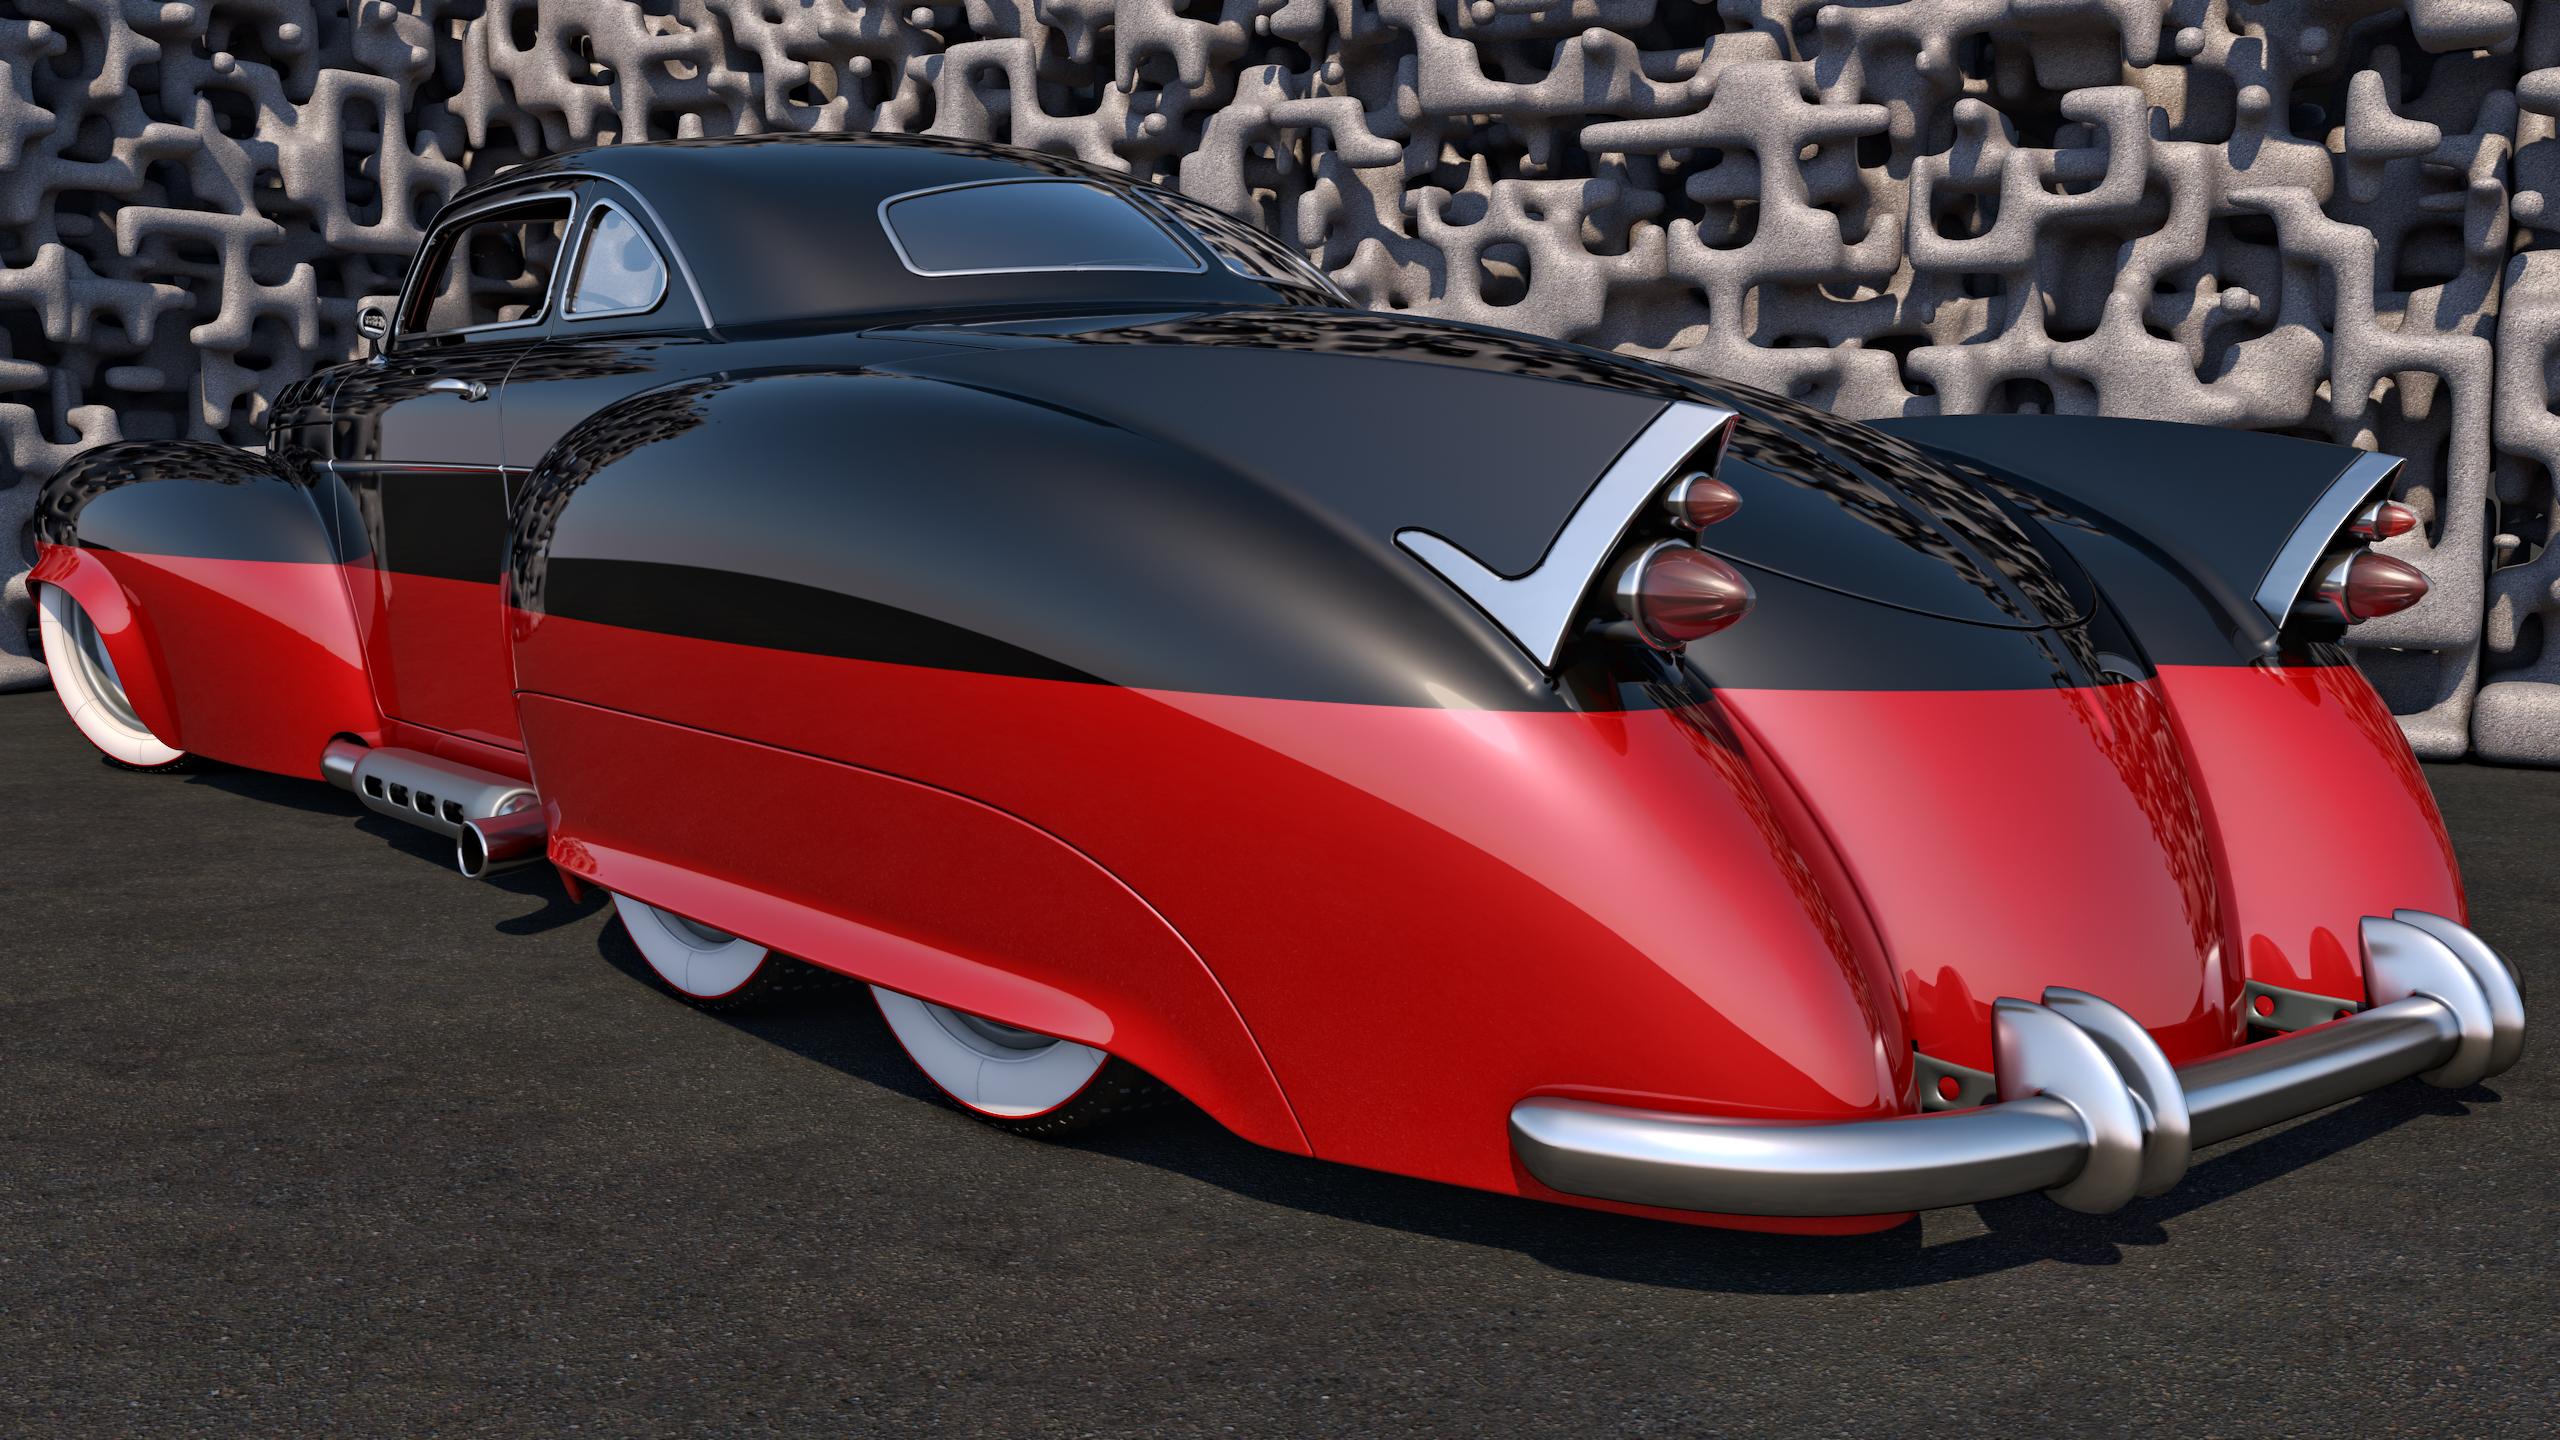 Image Result For Cool V Cars Wallpaper